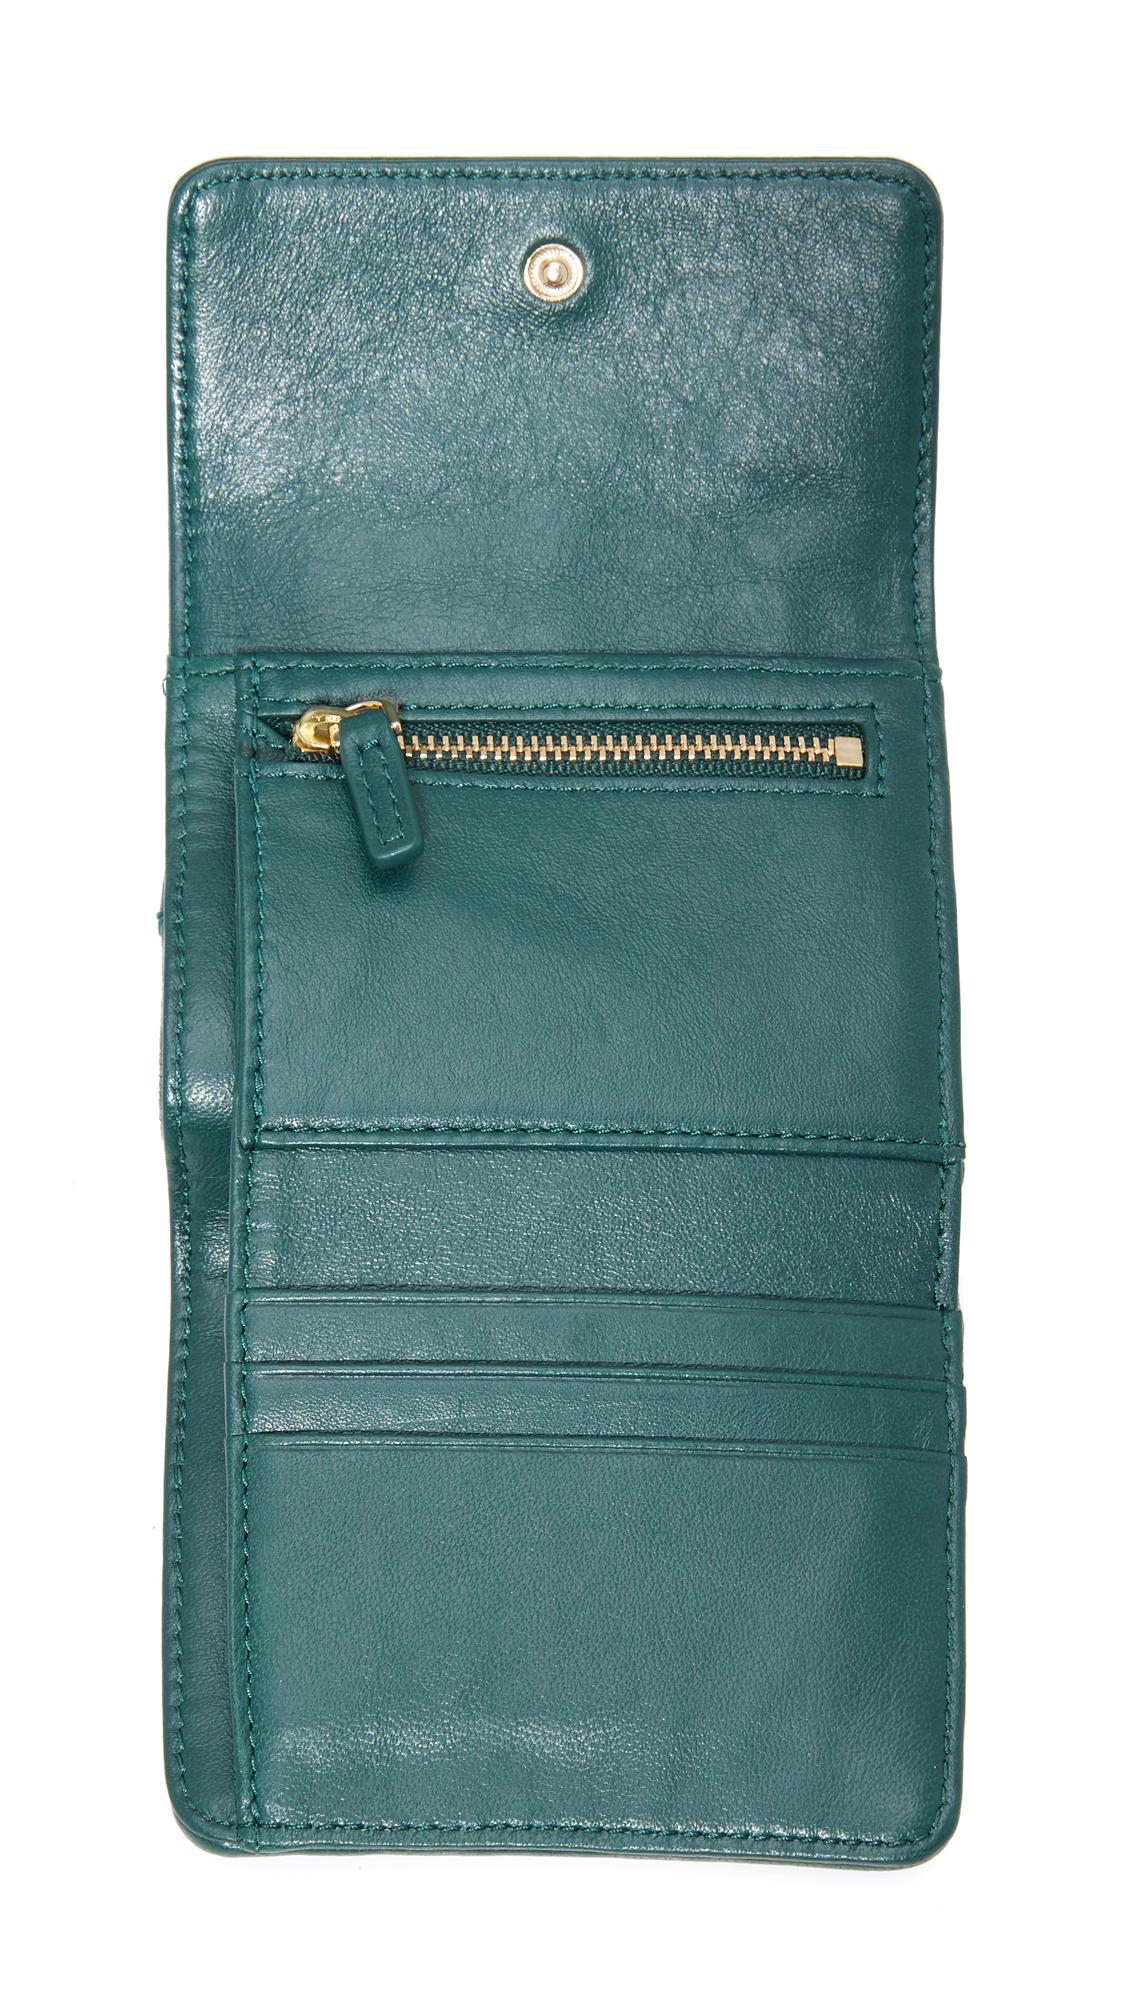 1f156427dfda ... best tory burch fleming mini flap wallet shopbop 0ba99 44b22